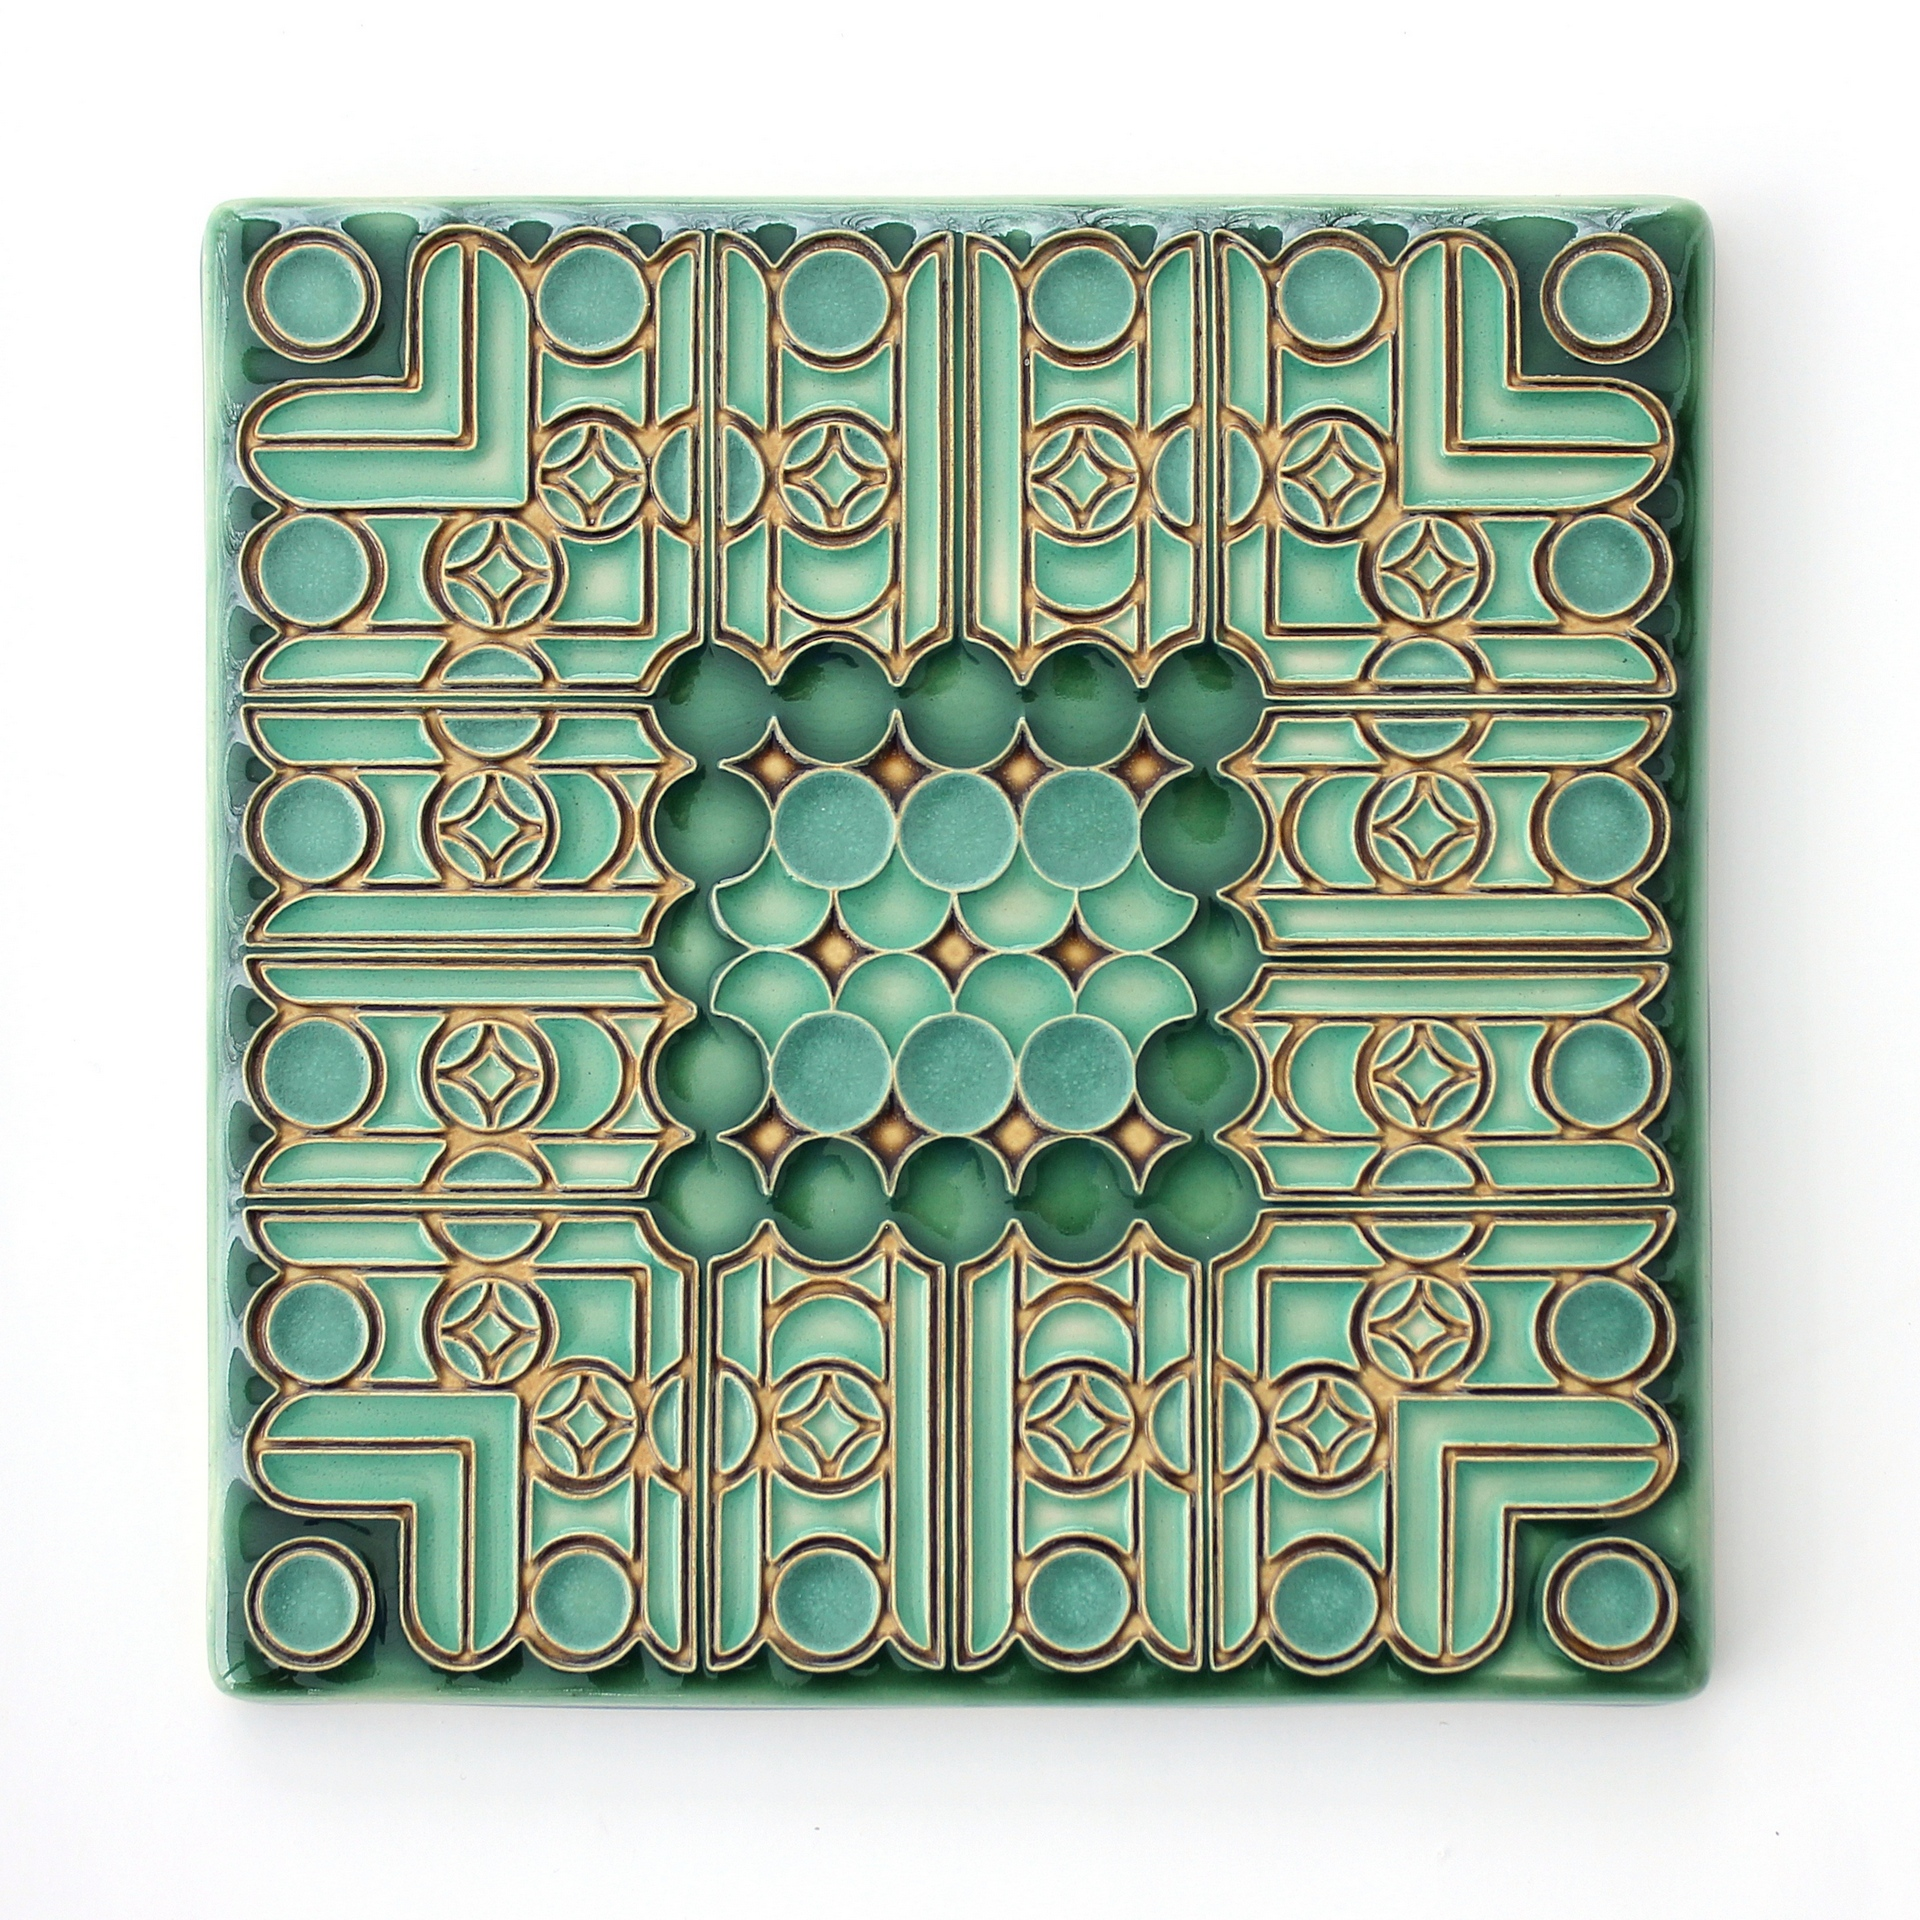 Sarah & Thomas Gelsanliter, Ceramics